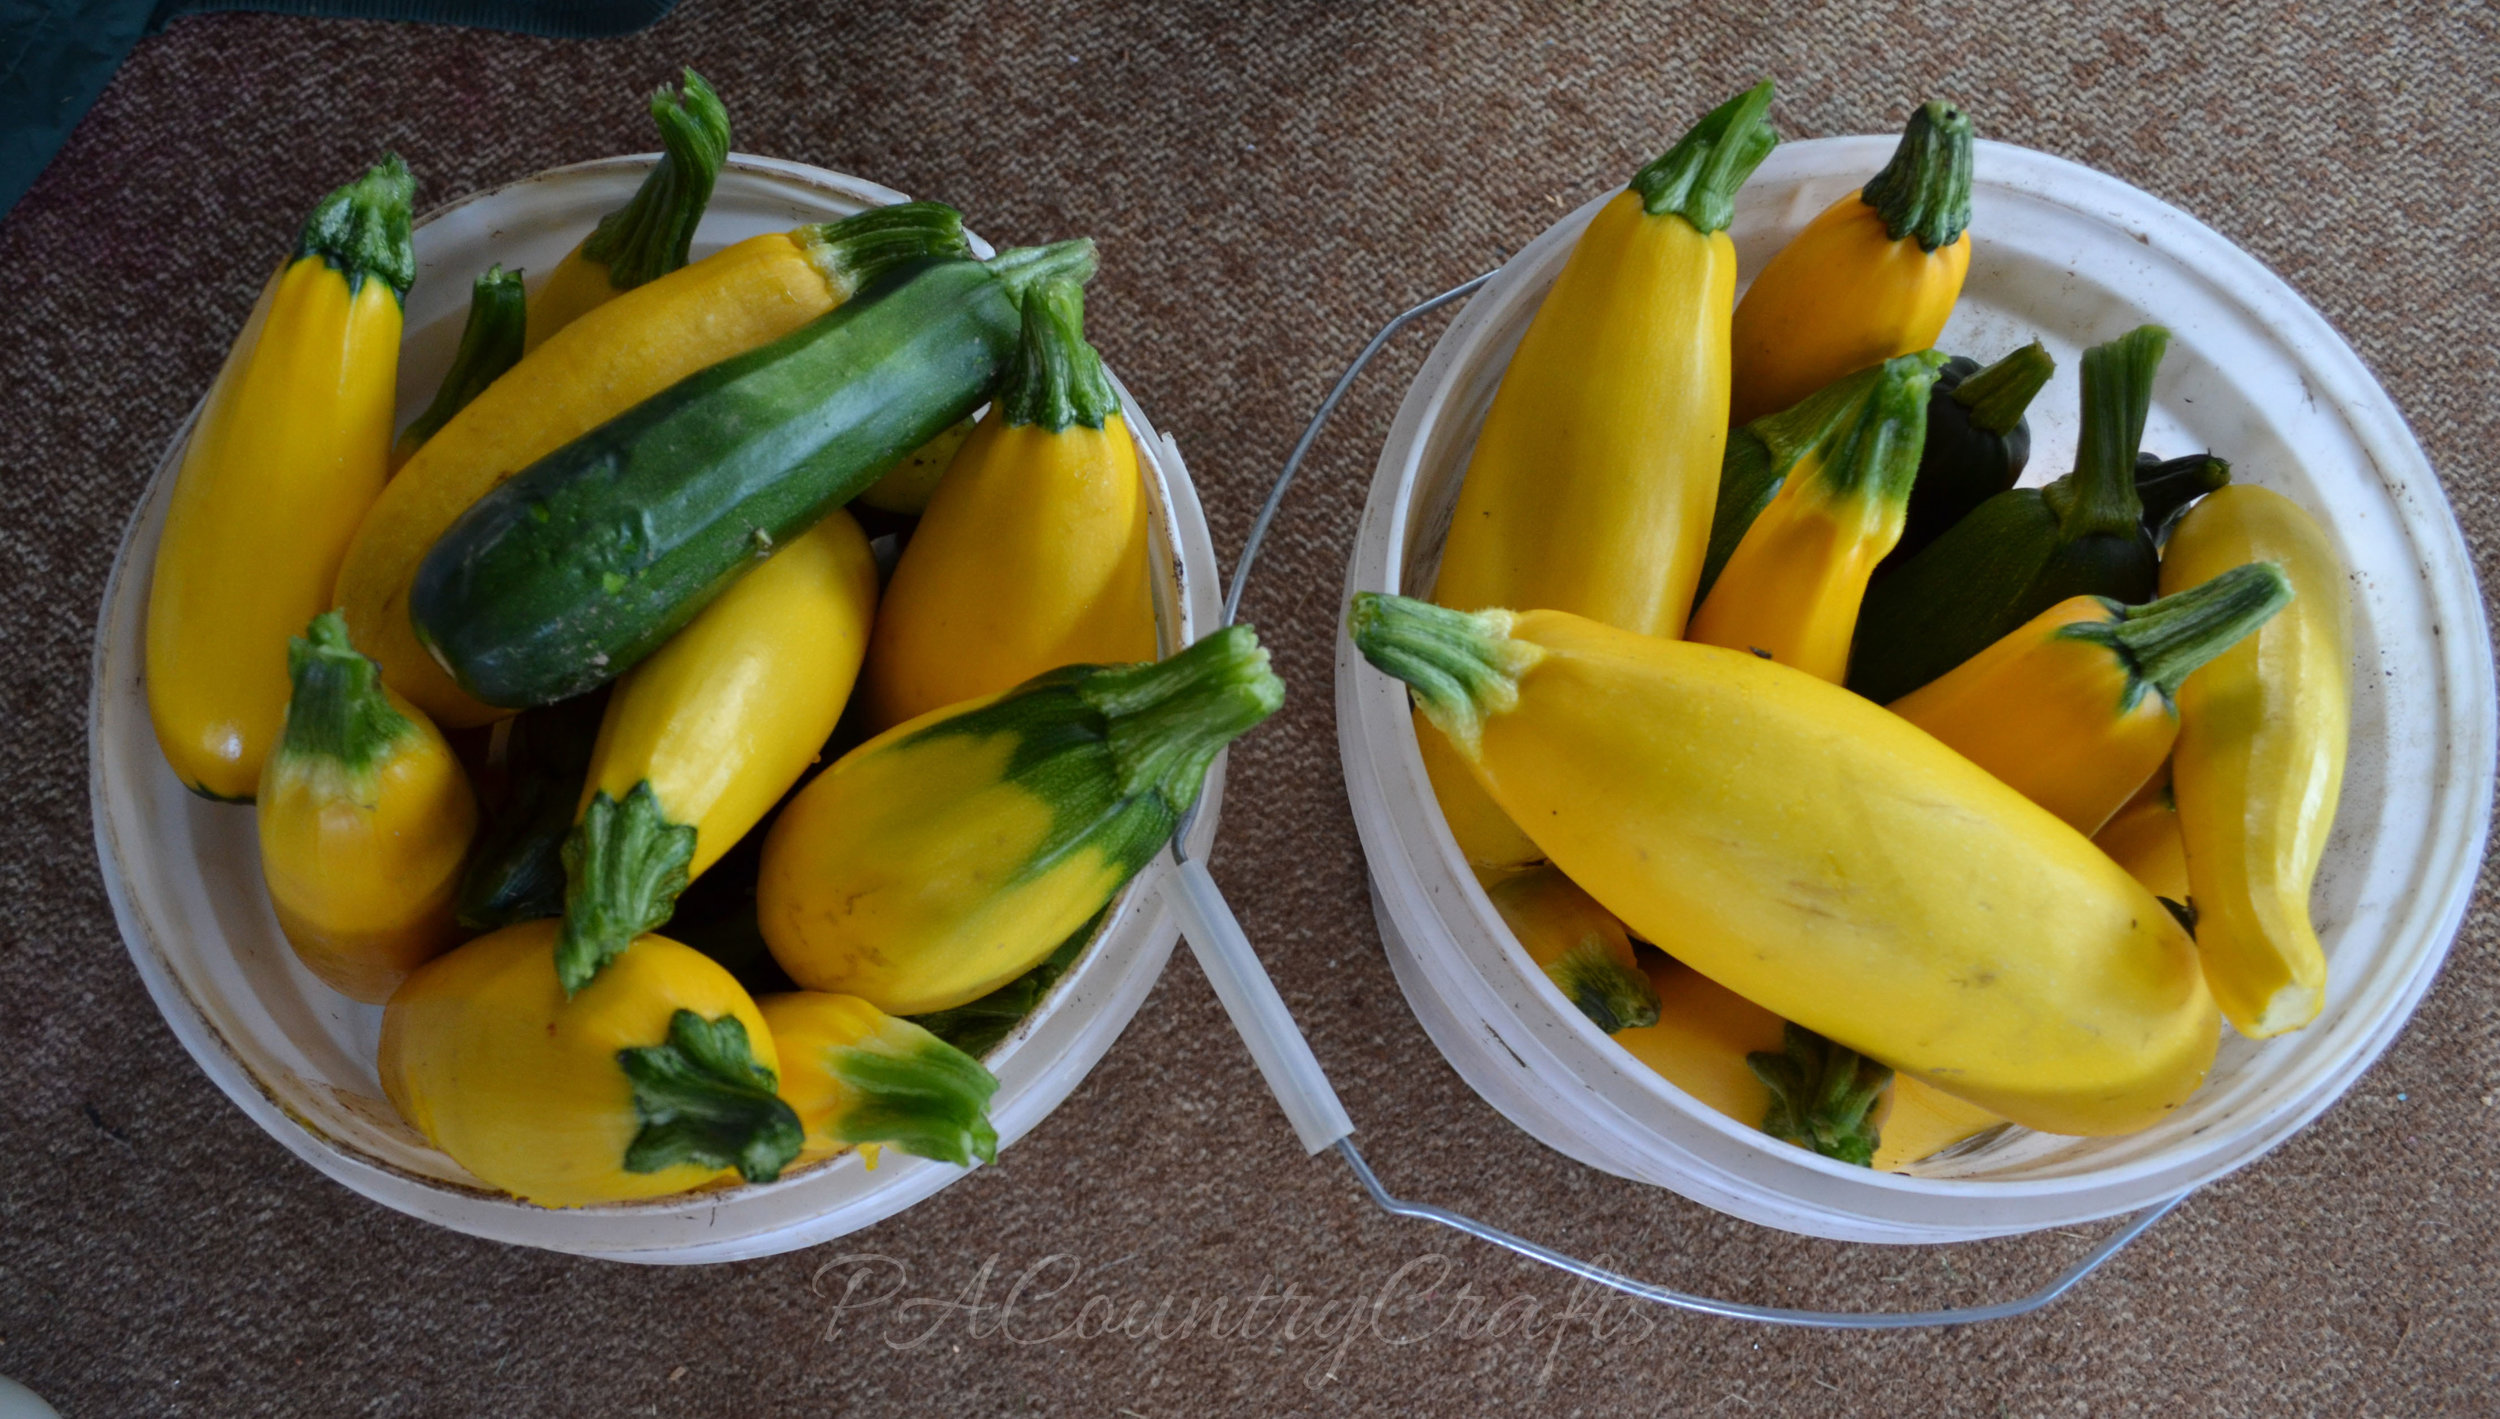 buckets of zucchini